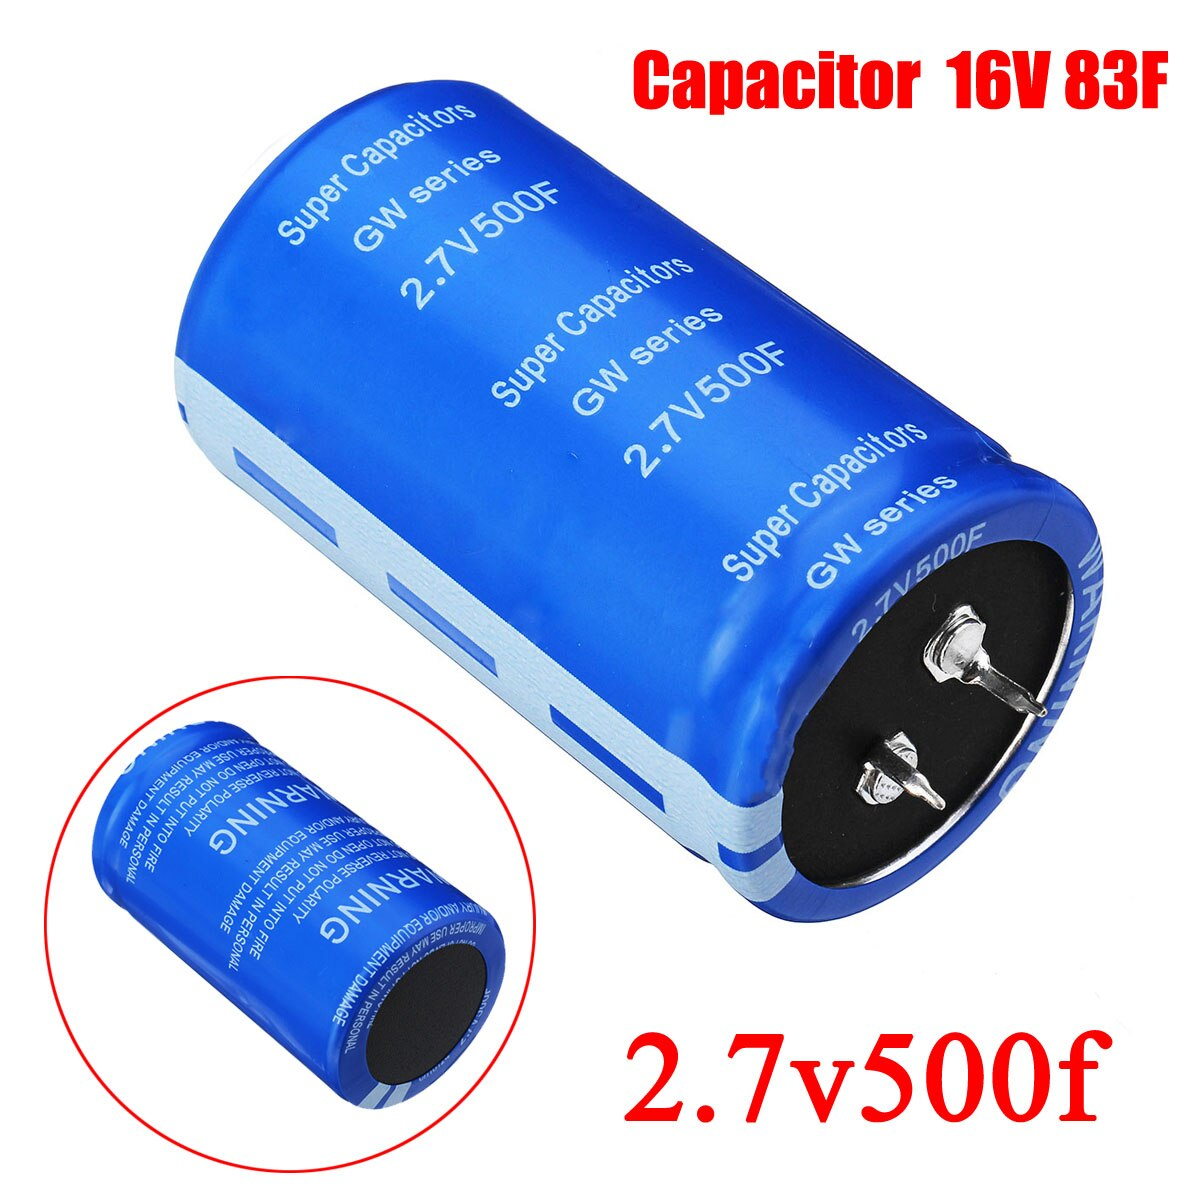 Condensador súper Fala 2.7v500f ESR bajo, pies de tornillo, súper condensador Ultracapacitor para coche 2,7 V 500F 6x4cm, súper condensador de faradio